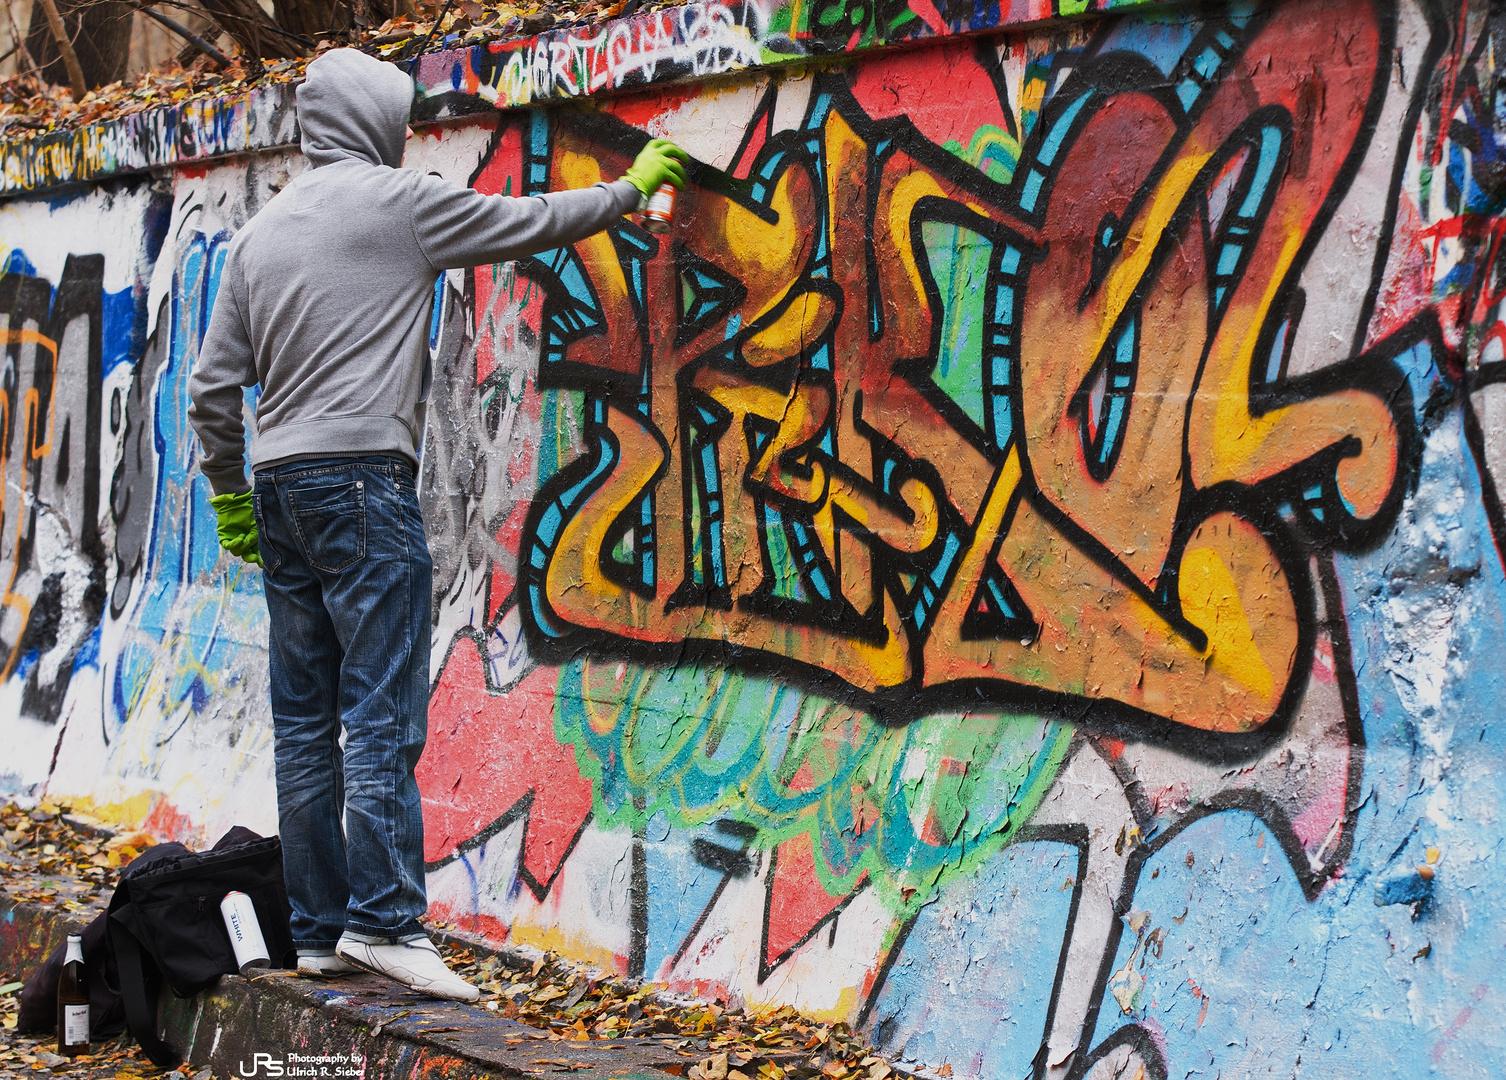 Der Graffiti-Sprayer